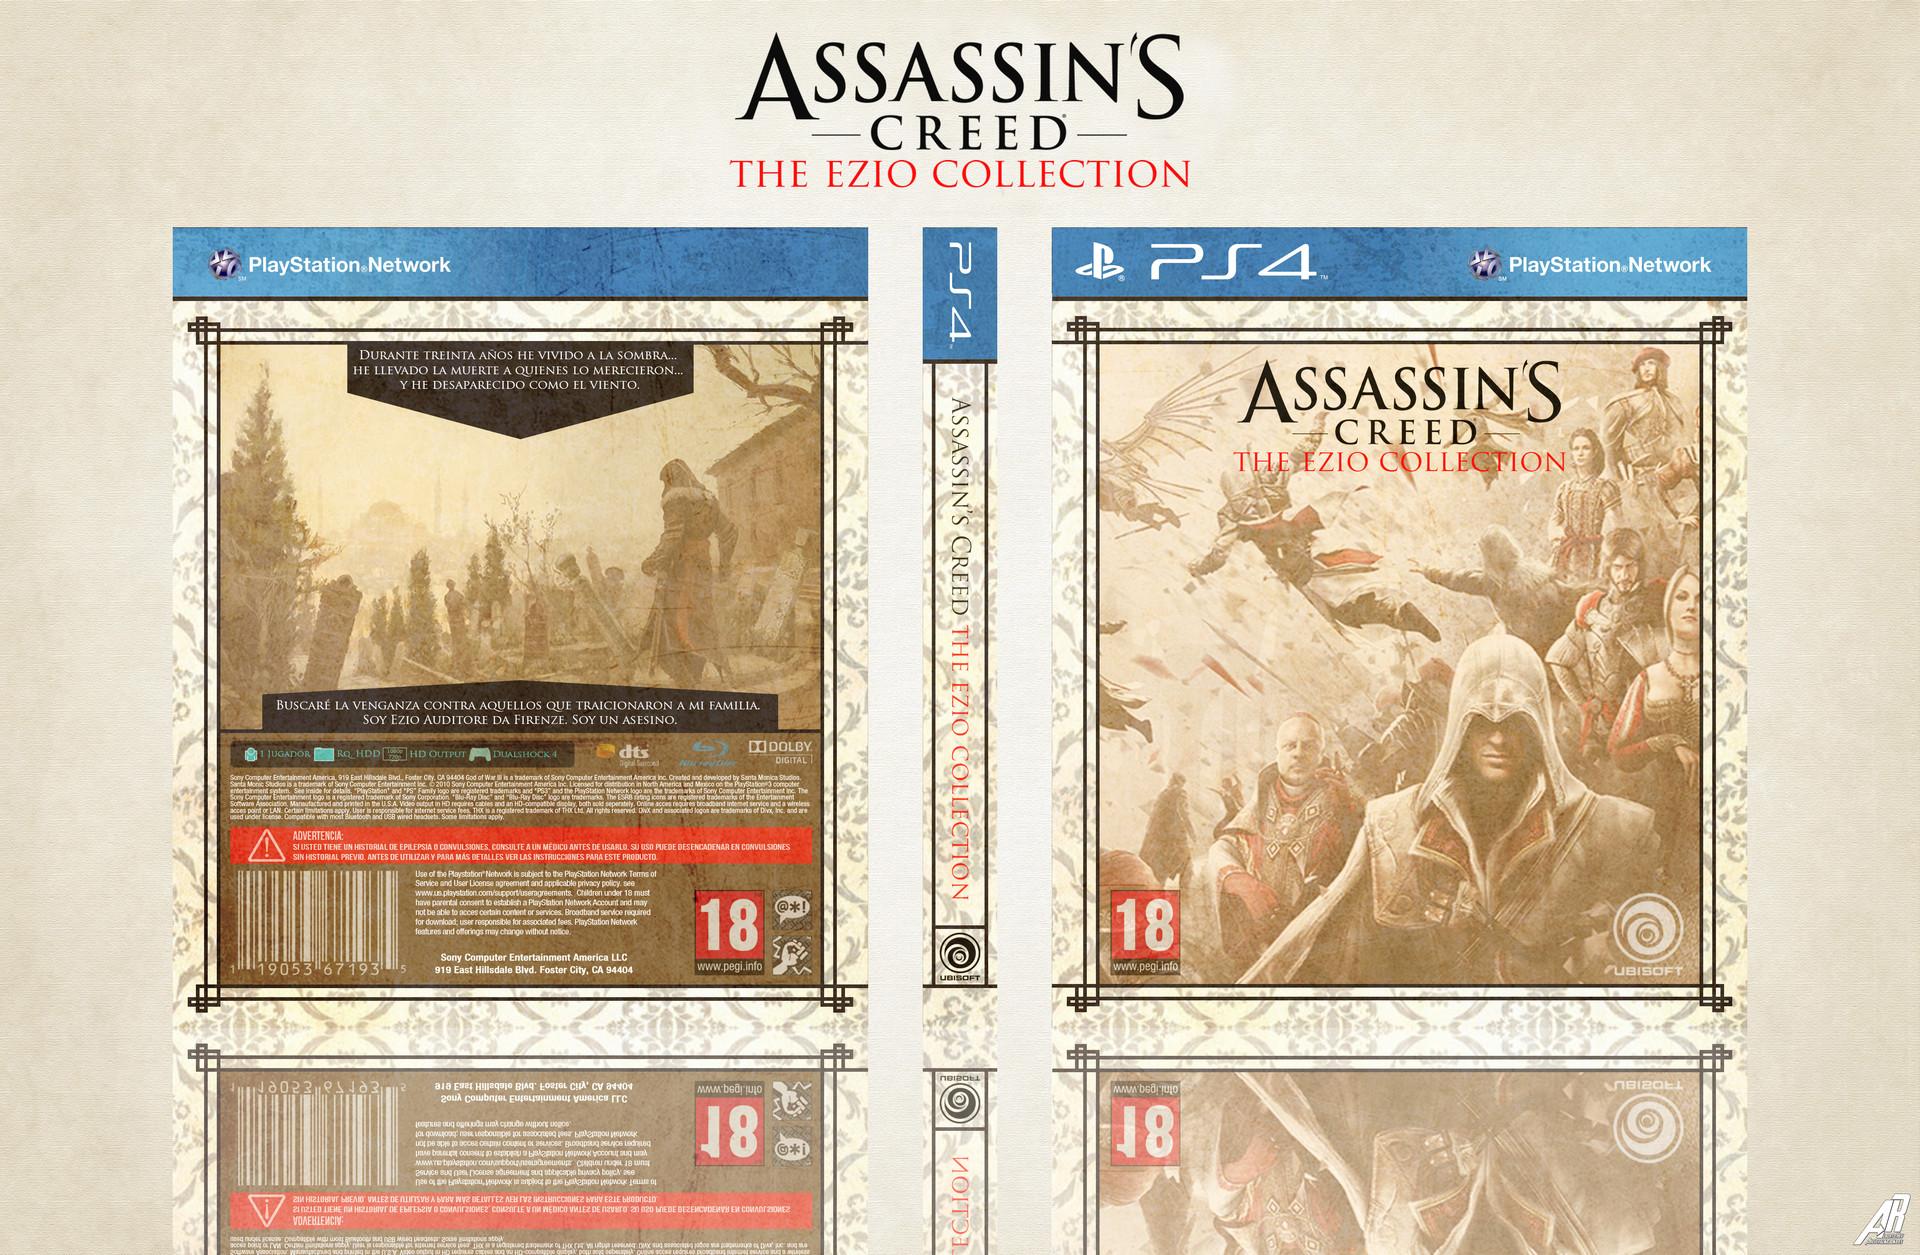 Artstation Assassin S Creed The Ezio Collection Alternative Box Alberto Rey Moreno